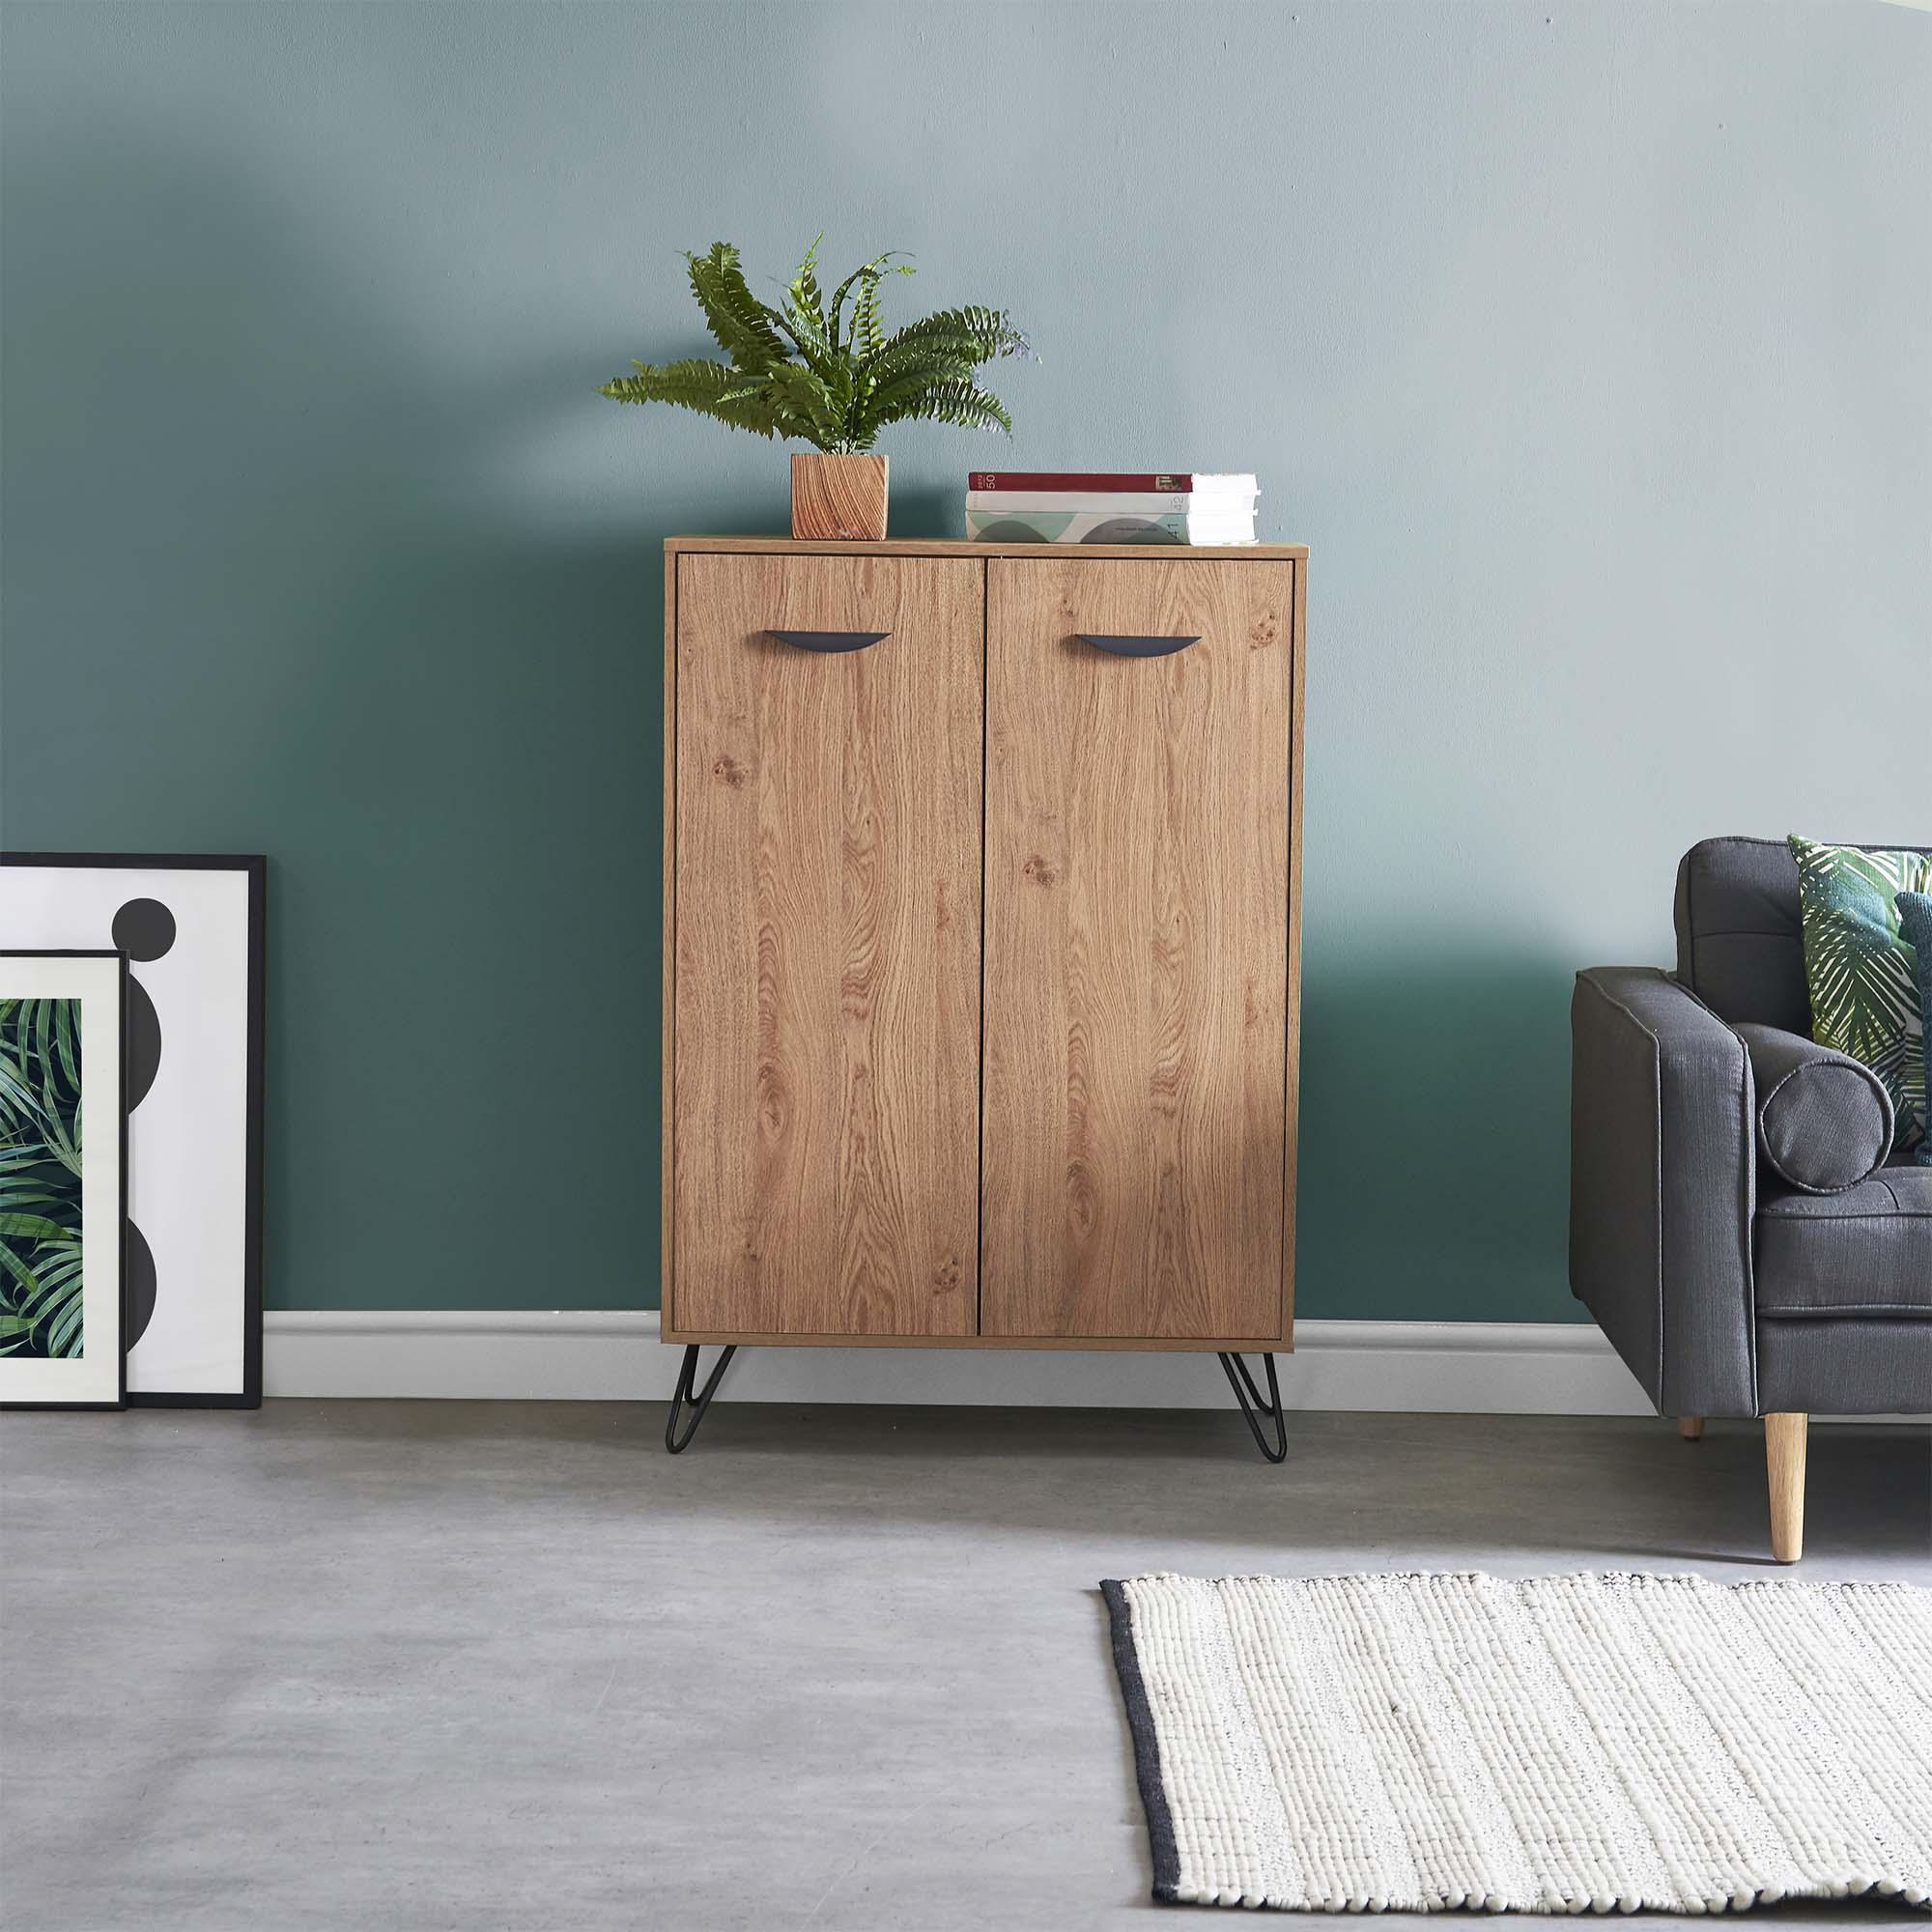 VonHaus Capri Sideboard 5 Shelves Oak Effect Tall Hallway Table Hairpin Legs 5056115708480 eBay